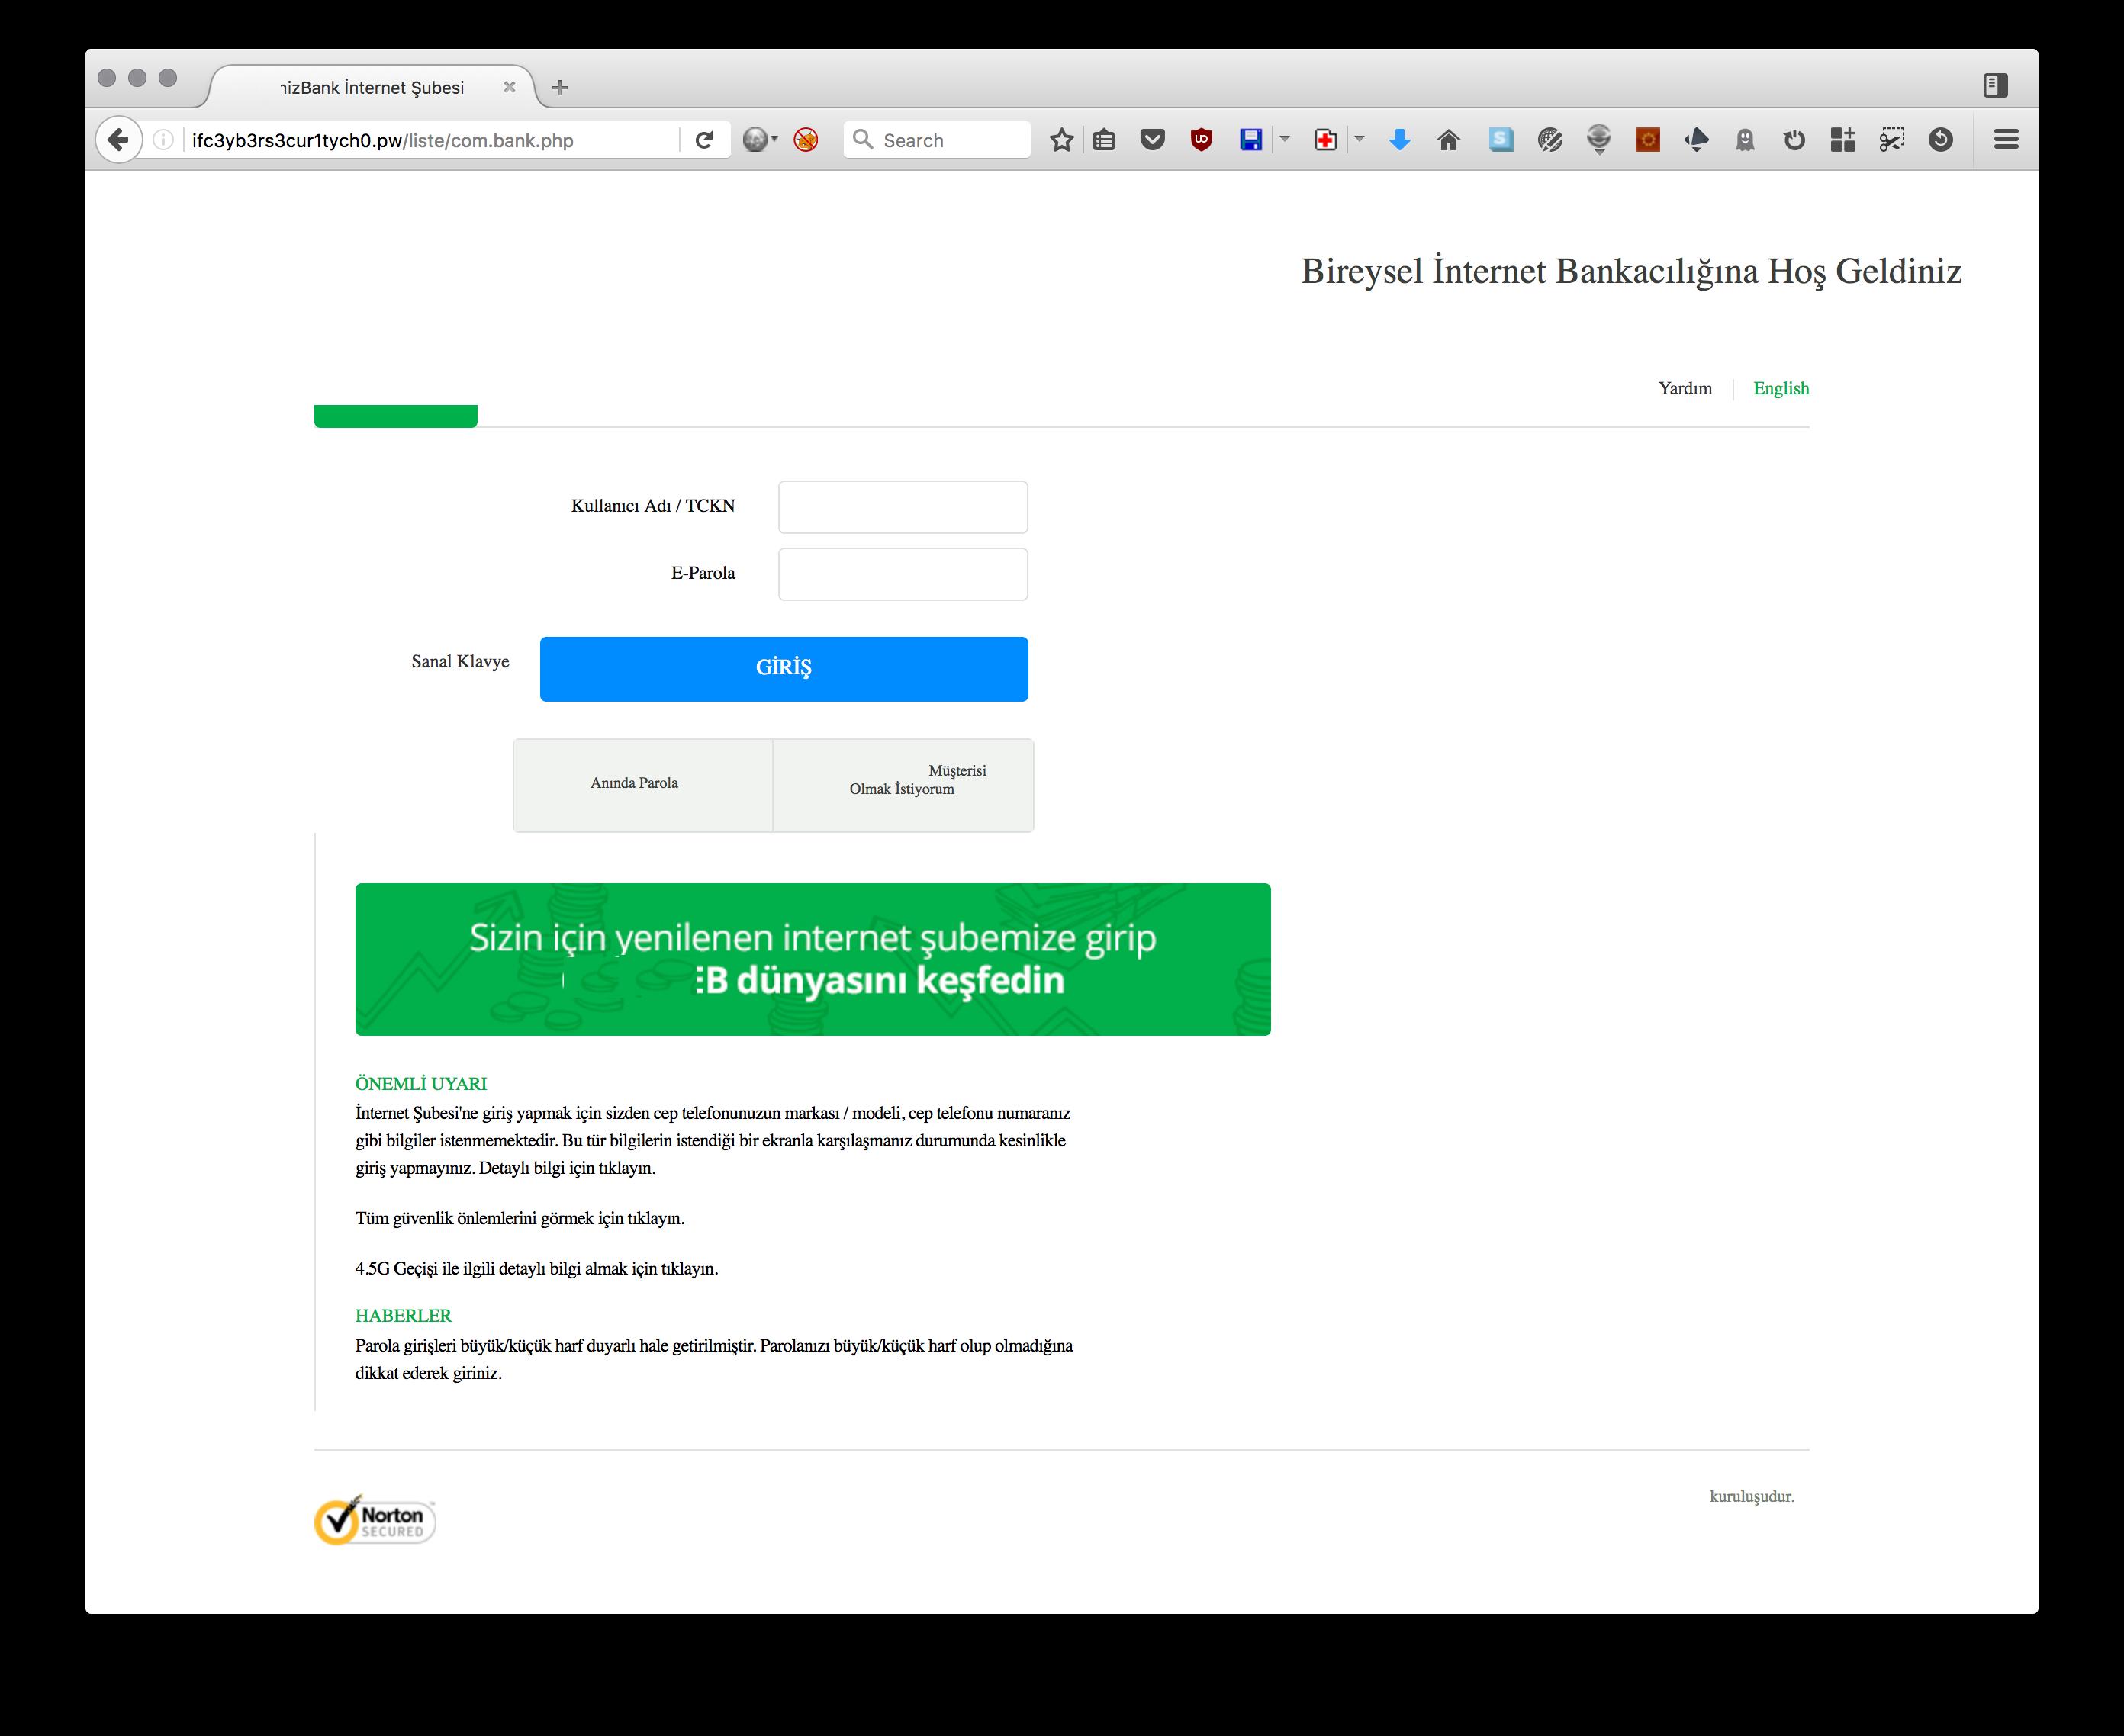 GitHub - bemre/bankbot-mazain: Analysis of BankBot/Mazain